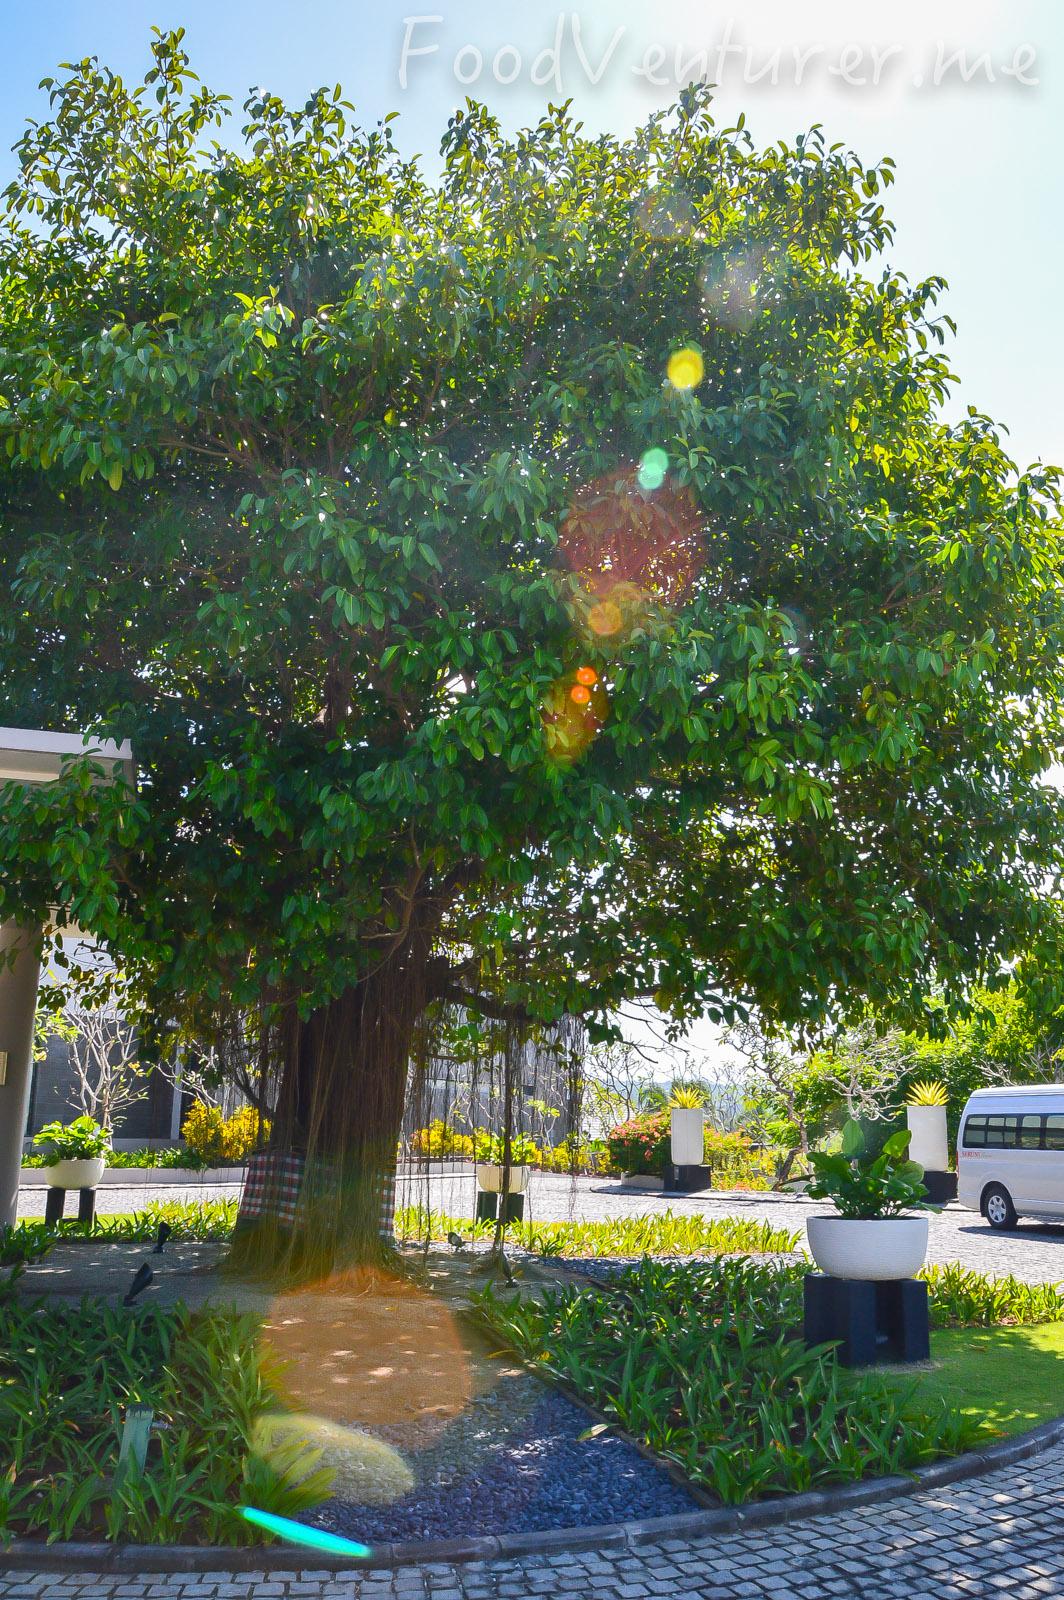 A Short Stop At Jumana Bar The Banyan Tree